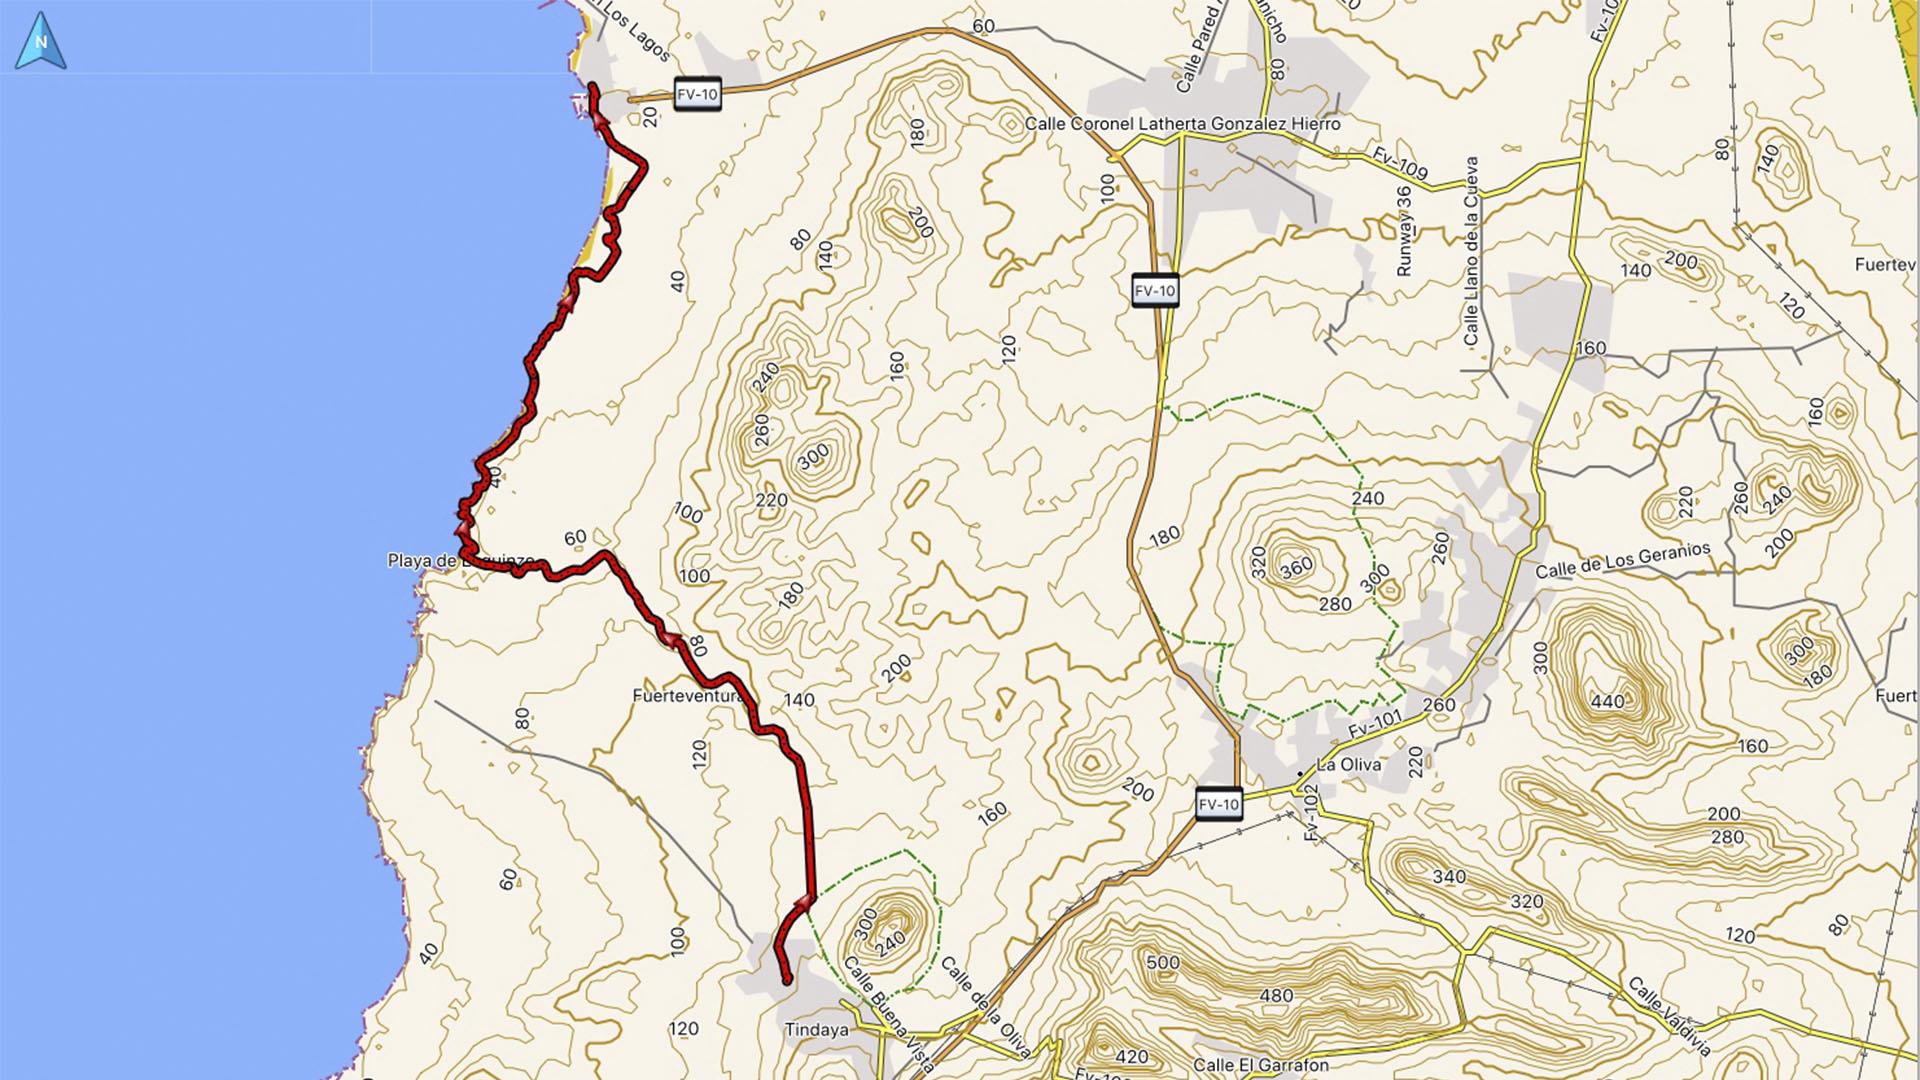 Wandern + Trekking auf Fuerteventura: Durch den Barranco Esquinzo nach El Cotillo.